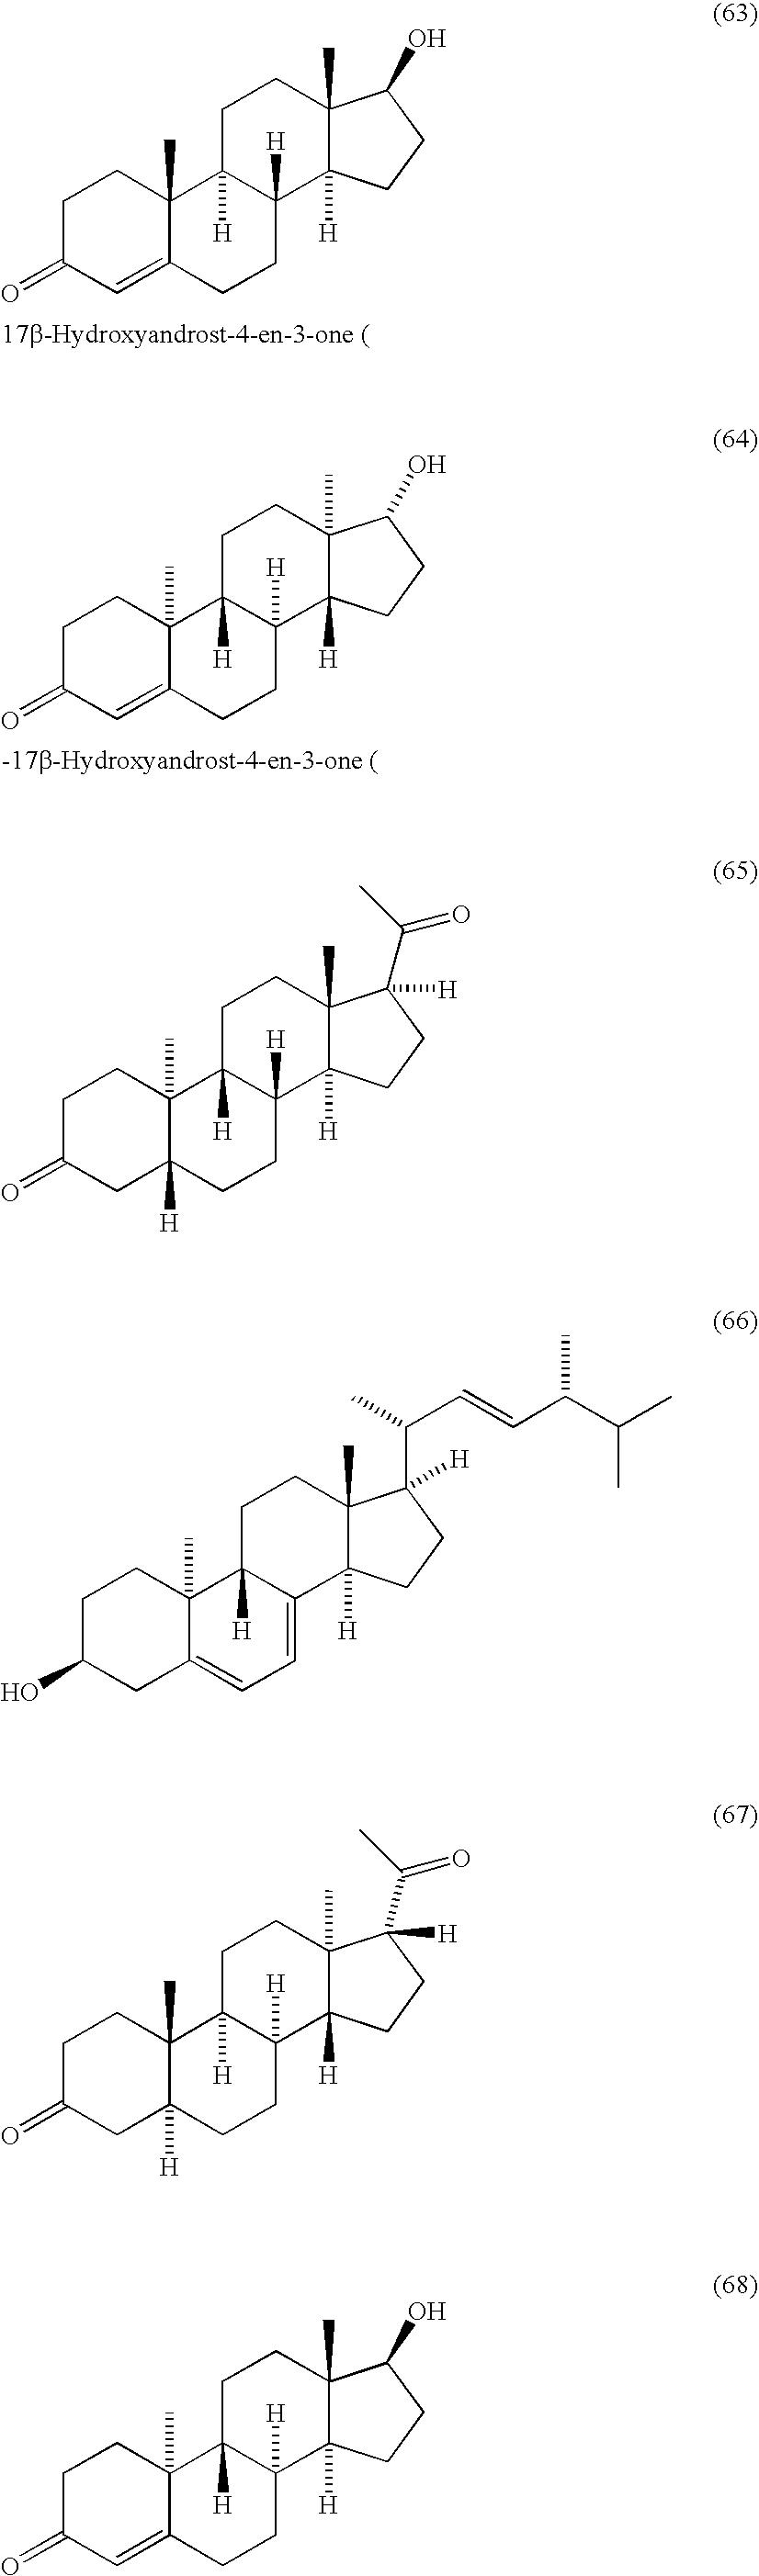 Us20080299220a1 Hydrophilic Non Aqueous Pharmaceutical Carriers Liquid Ring Vacuum Pump Diagram Closed Loop Butane Extraction System Figure 20081204 C00025